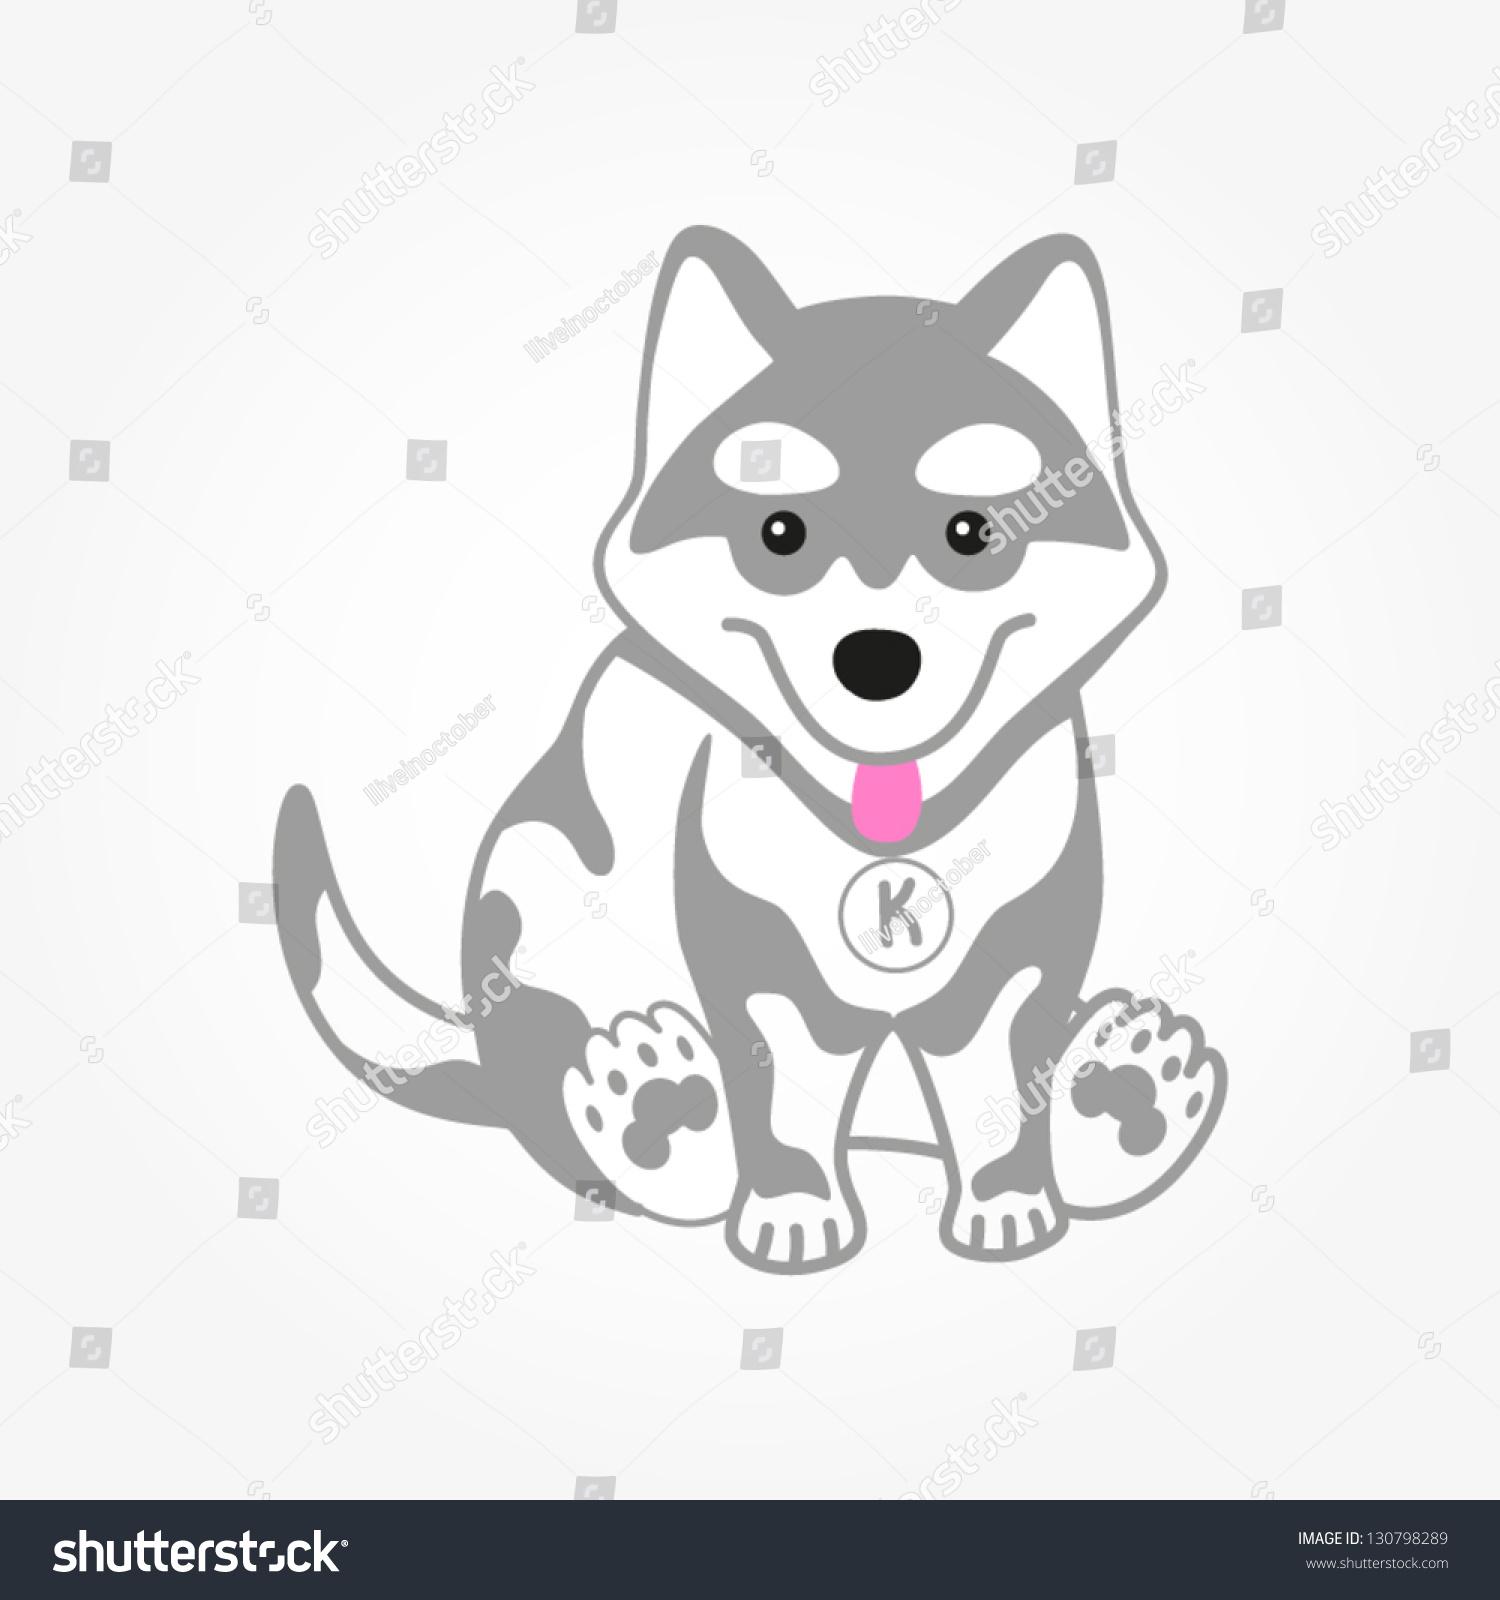 free clipart husky dog - photo #29